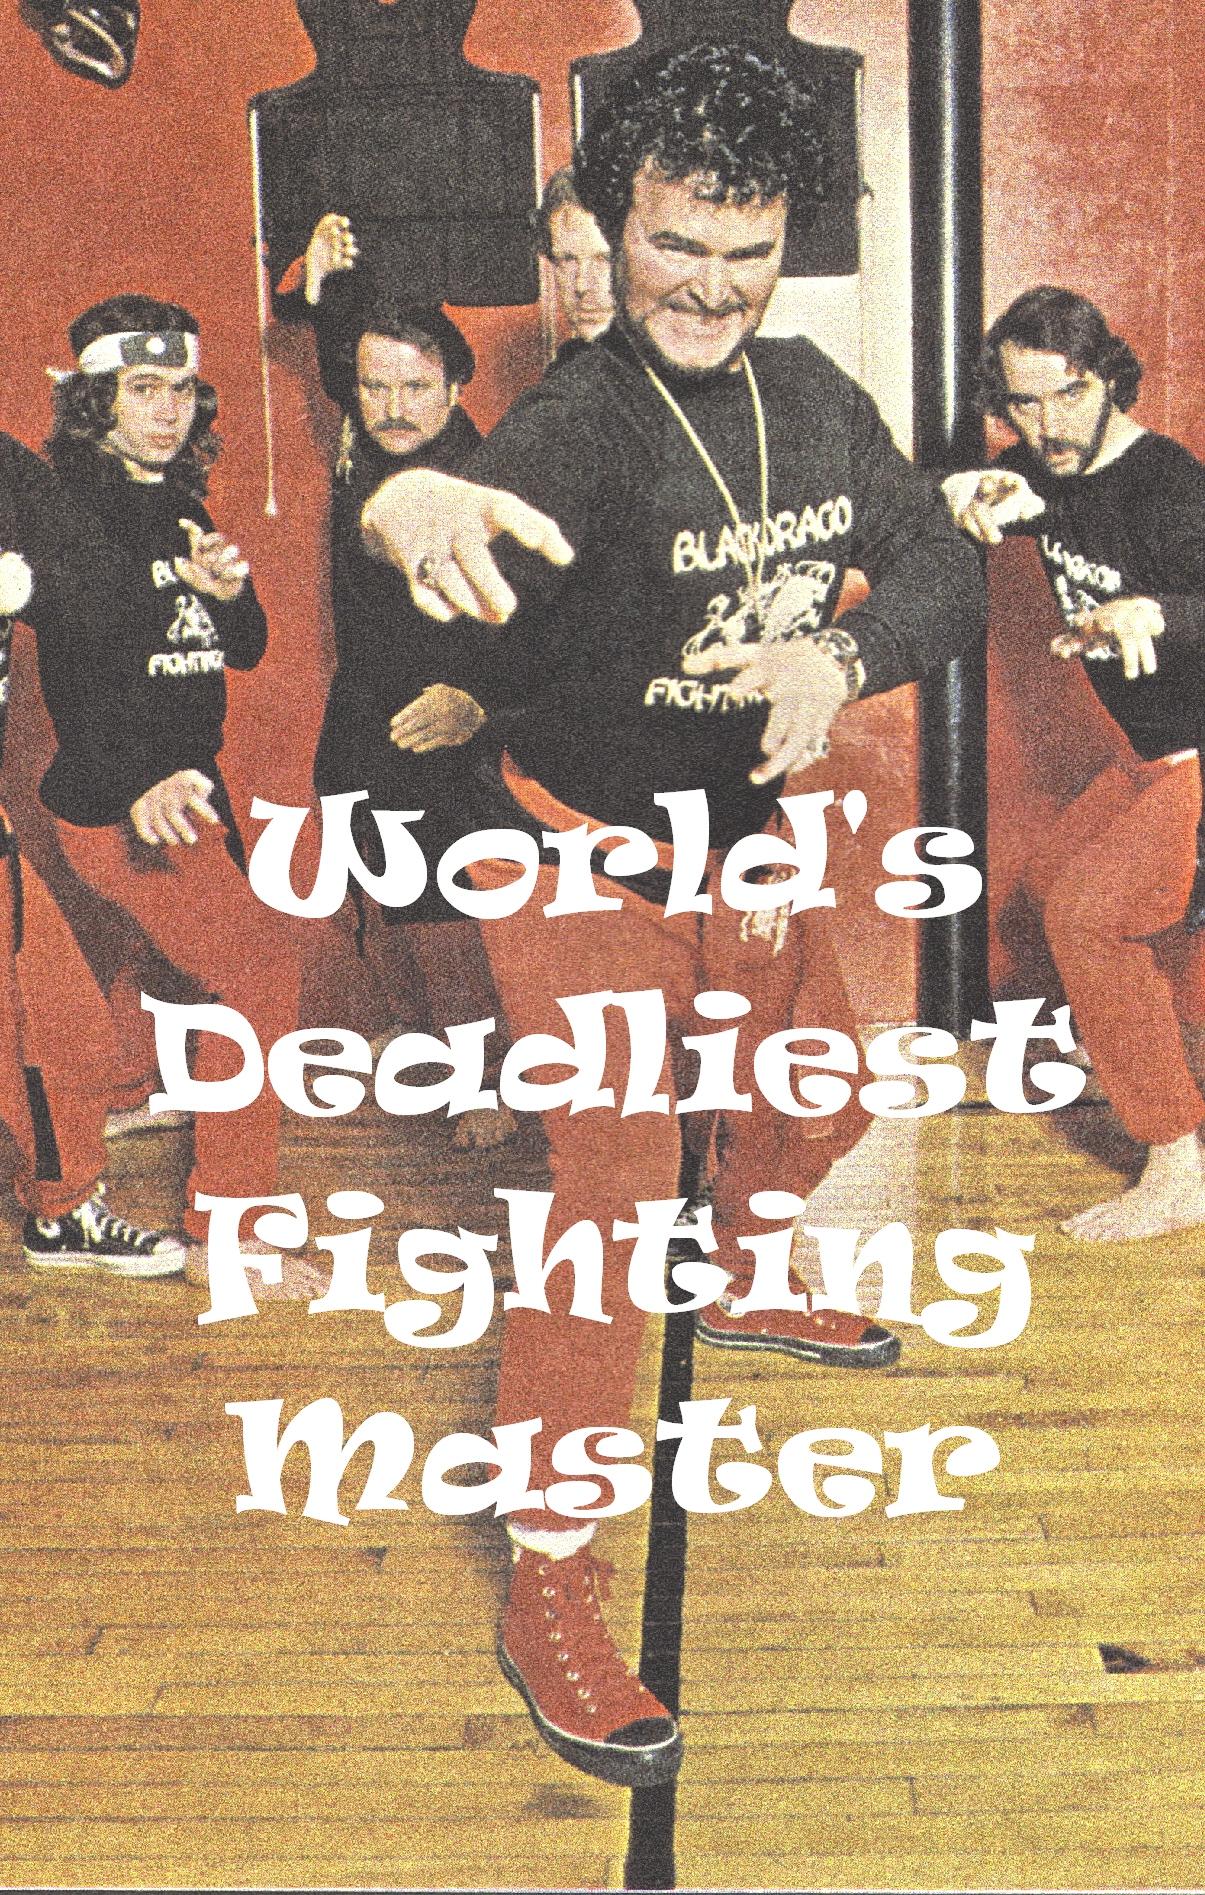 WORLD'S DEADLIEST FIGHTING MASTER